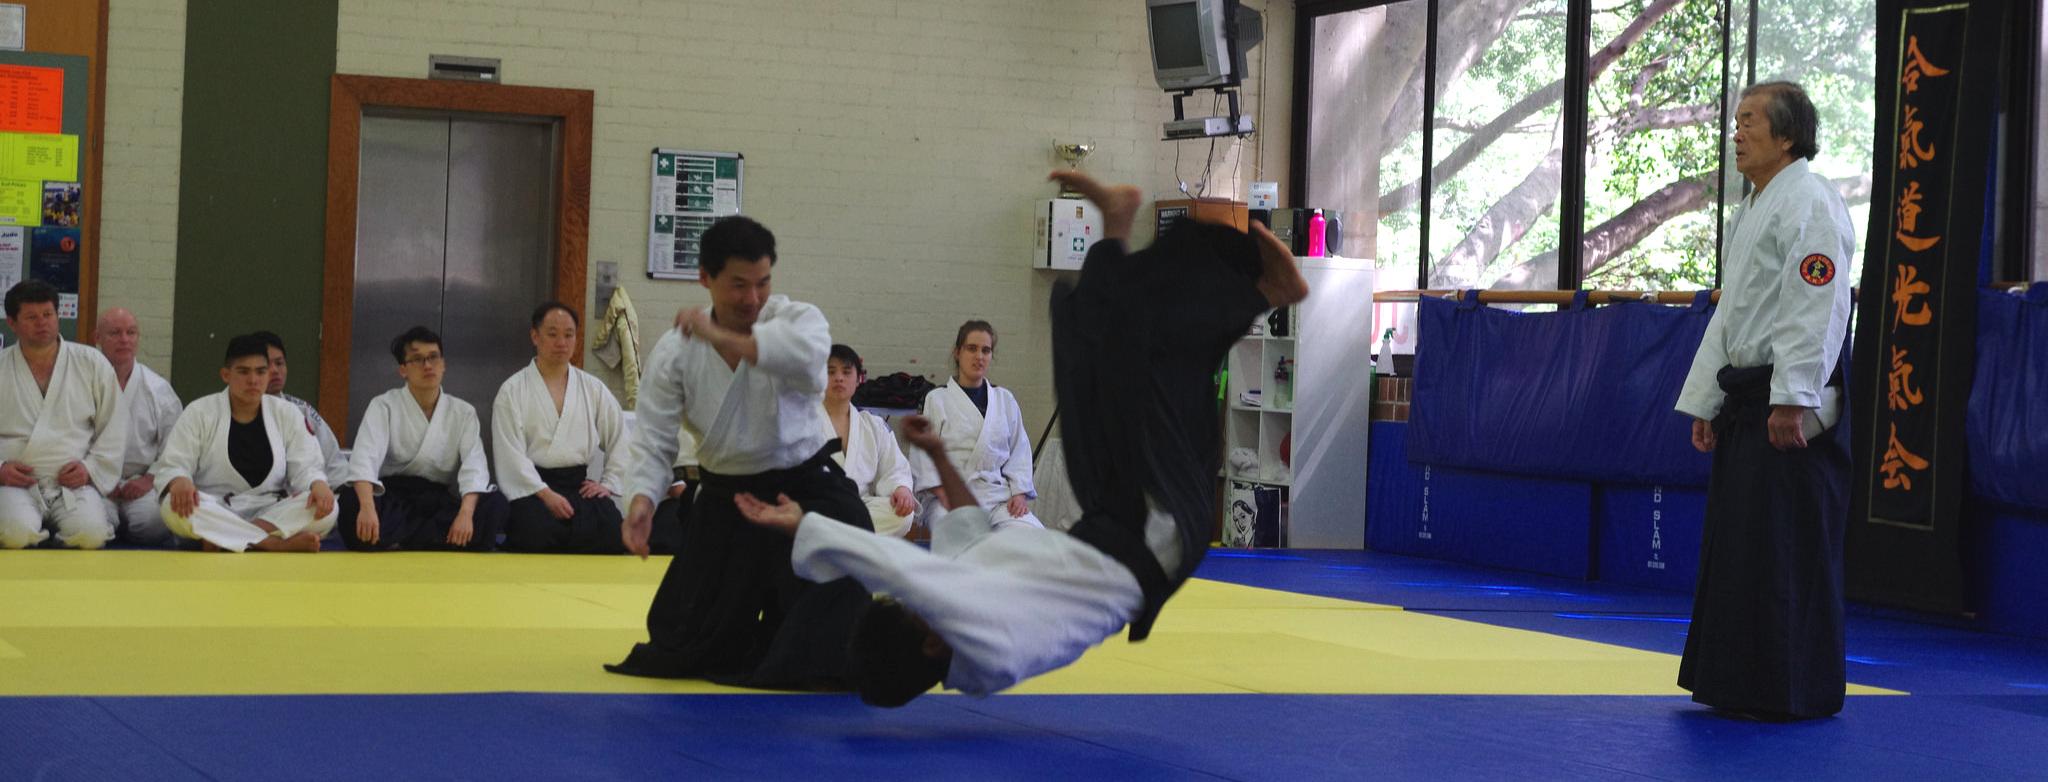 Aikido_demo_unsw.jpg